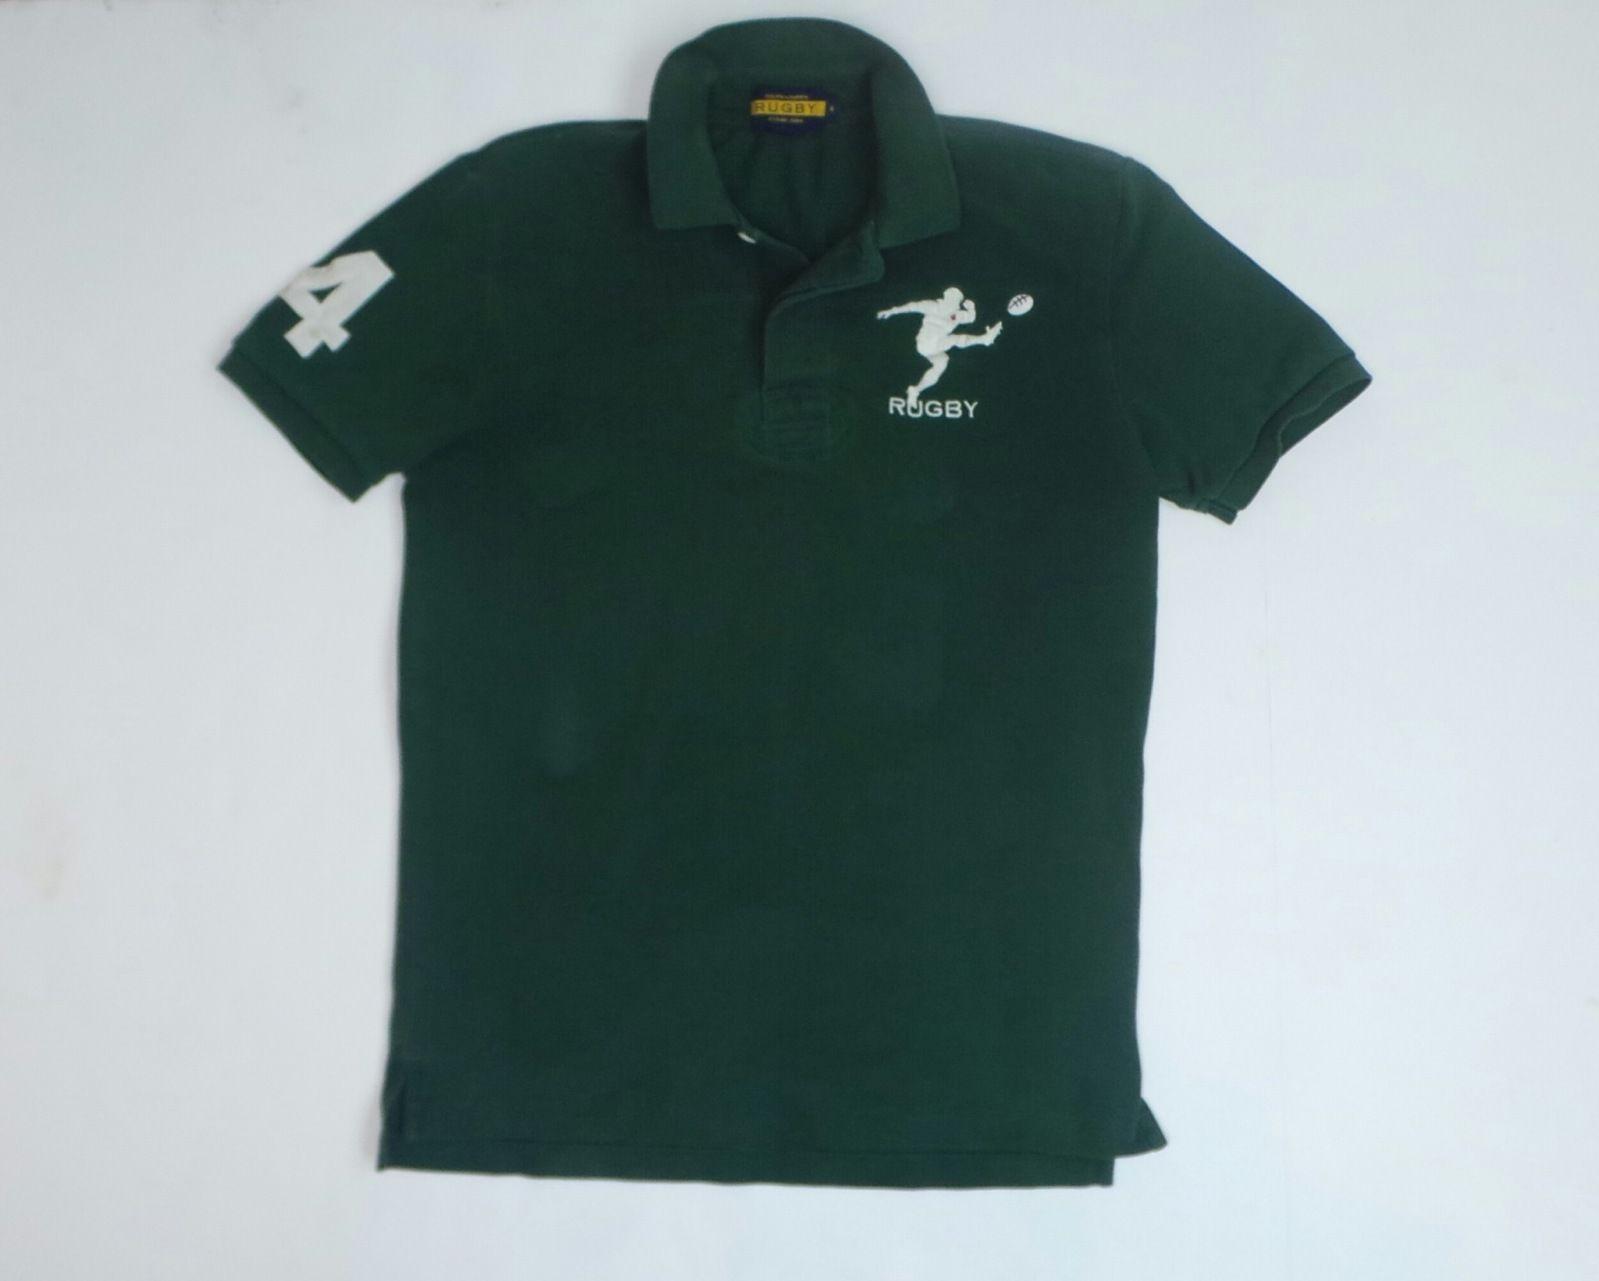 Polo Ralph Lauren Men's Regular Short Sleeve Sleeve 100% Cotton Solid  Casual Shirts | eBay